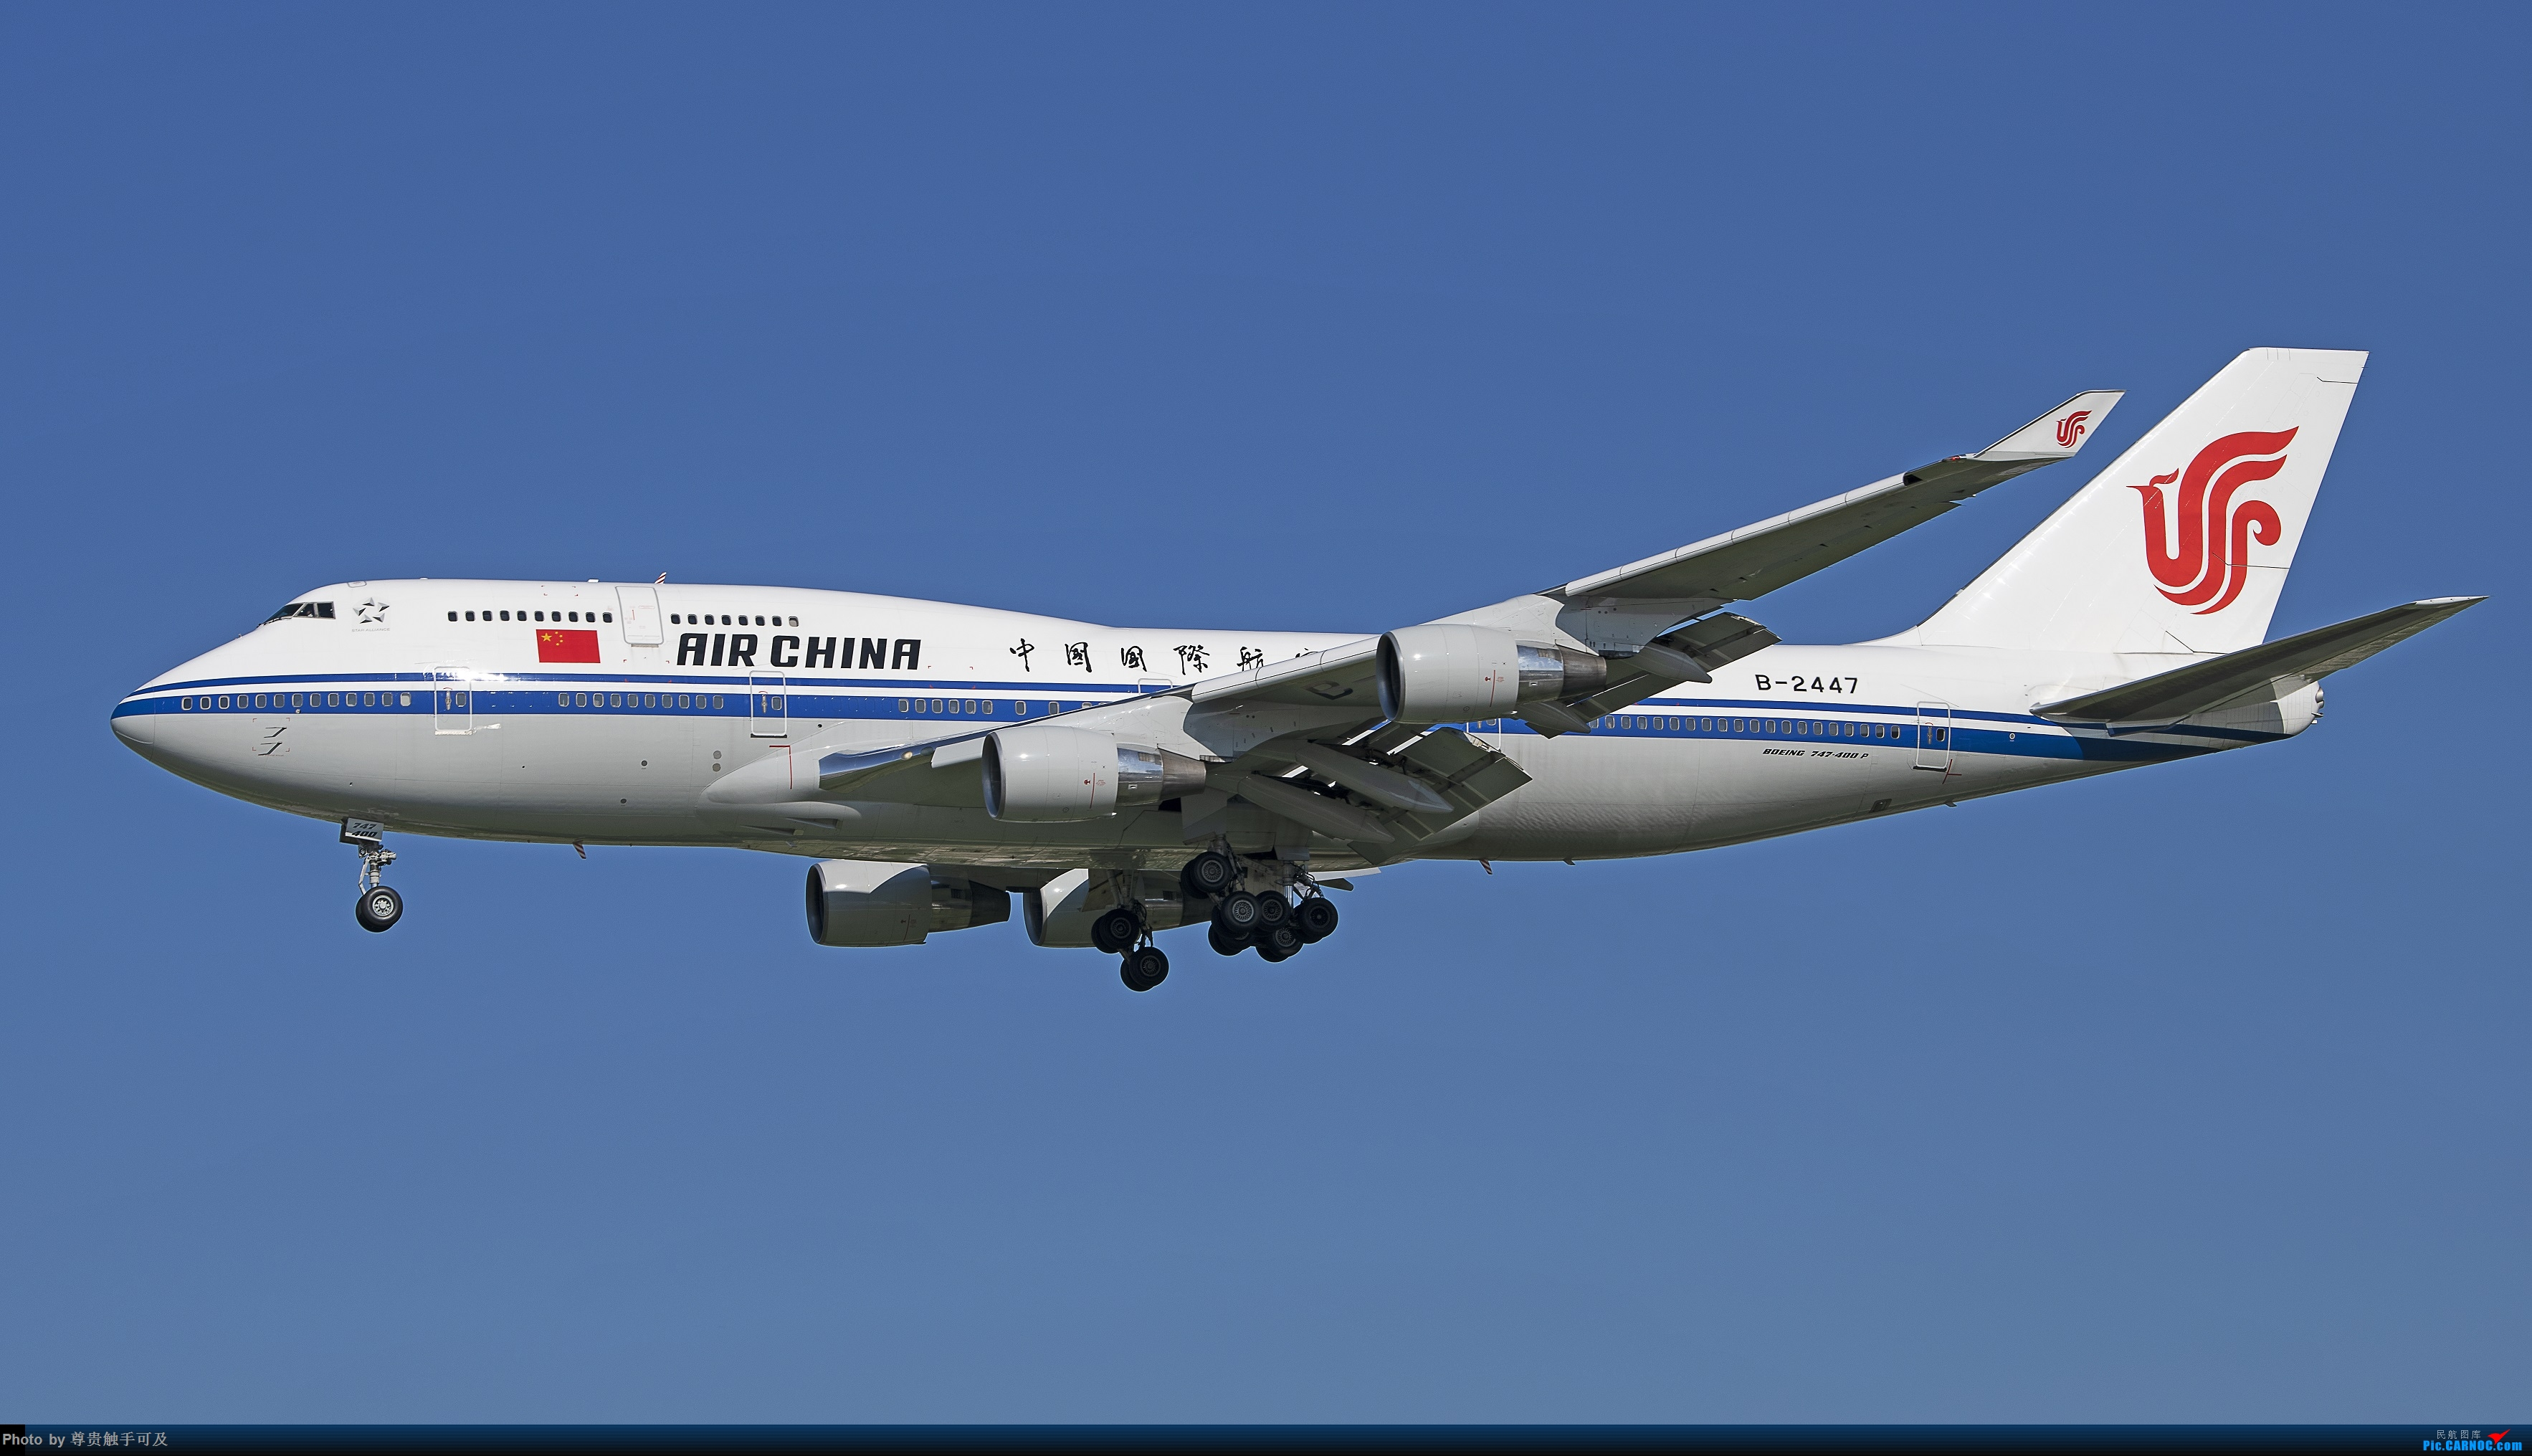 Re:继380后,再晒晒747,都是大家伙! 哈.... BOEING 747-400 B-2447 T3